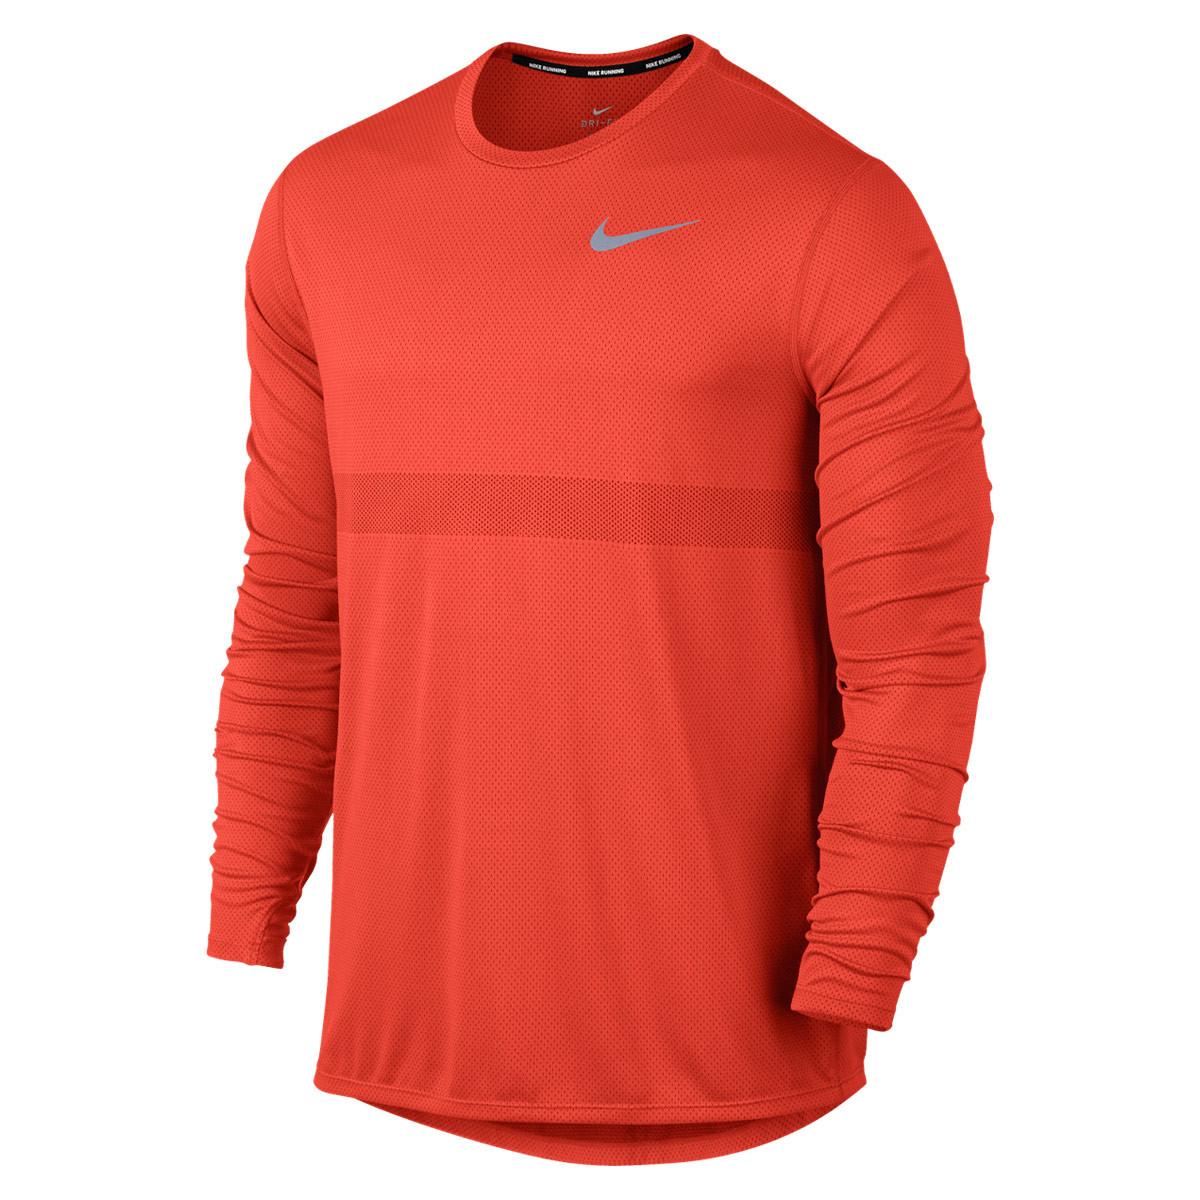 9834d19a0 Nike Zonal Cooling Relay Running Longsleeve - Running tops for Men - Red |  21RUN